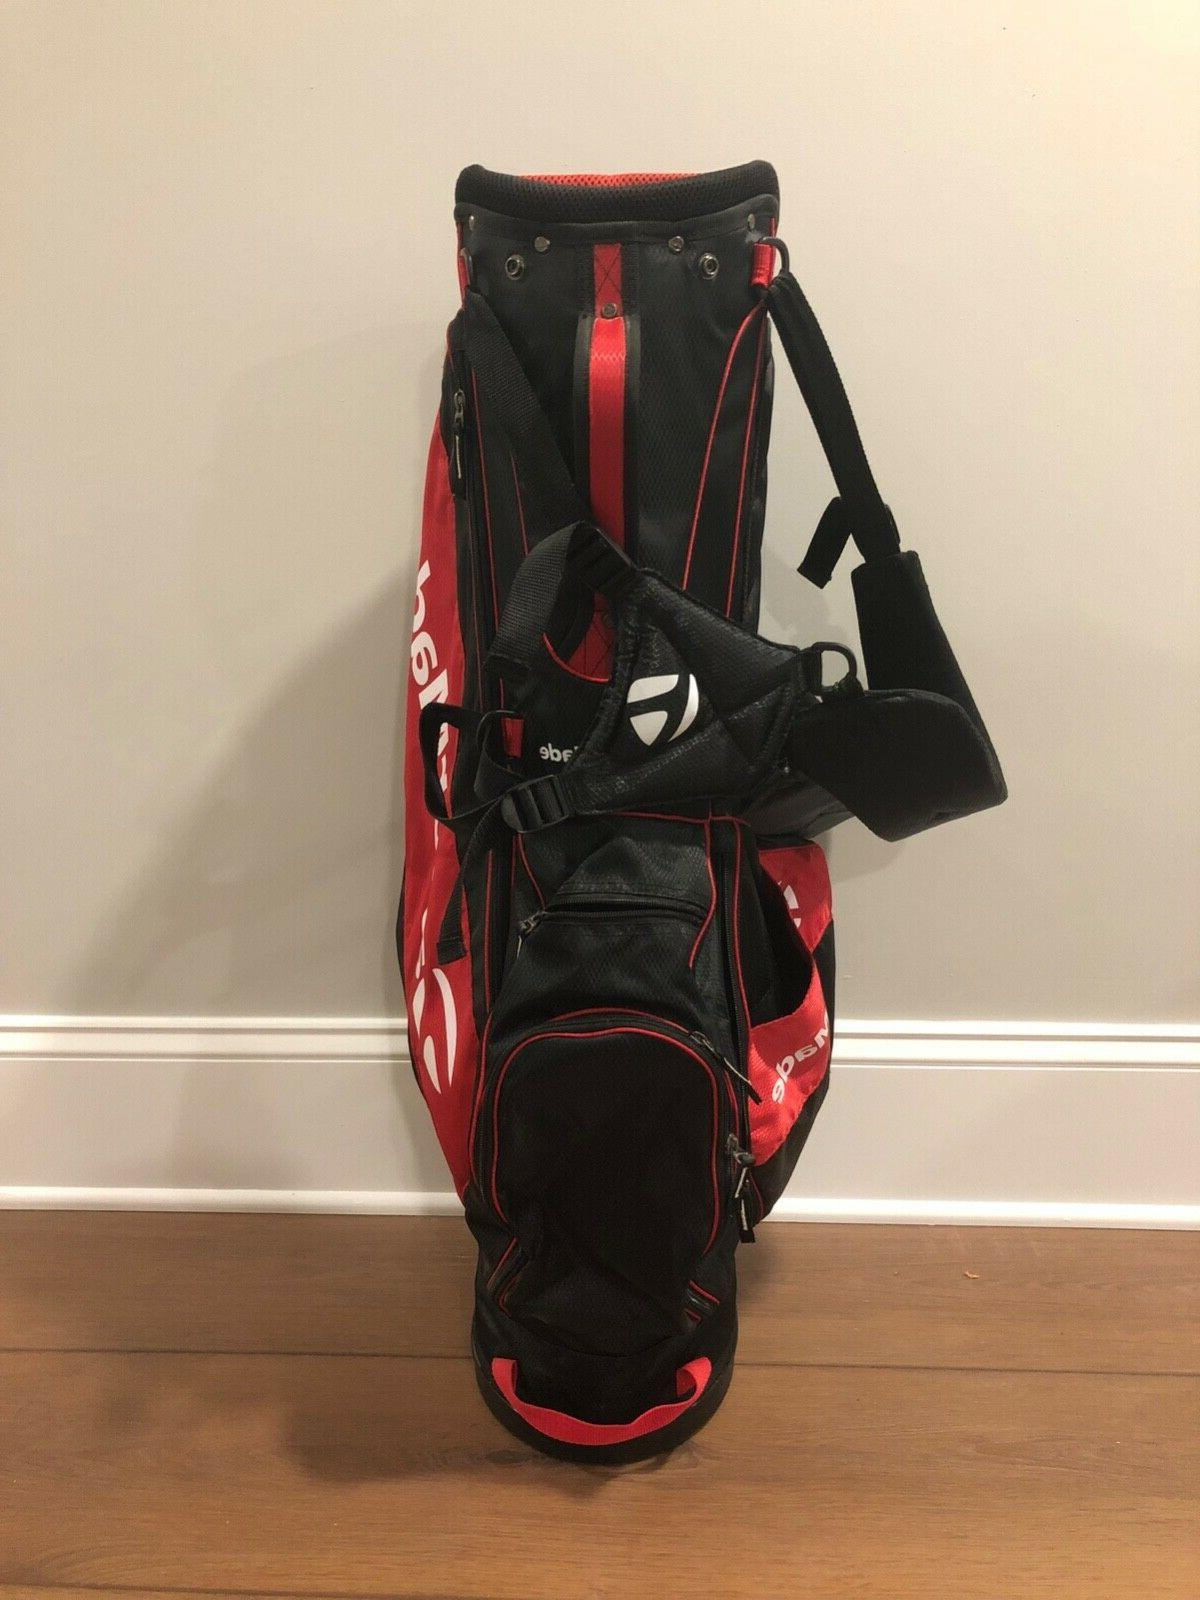 TaylorMade Golf Bag Red/Black